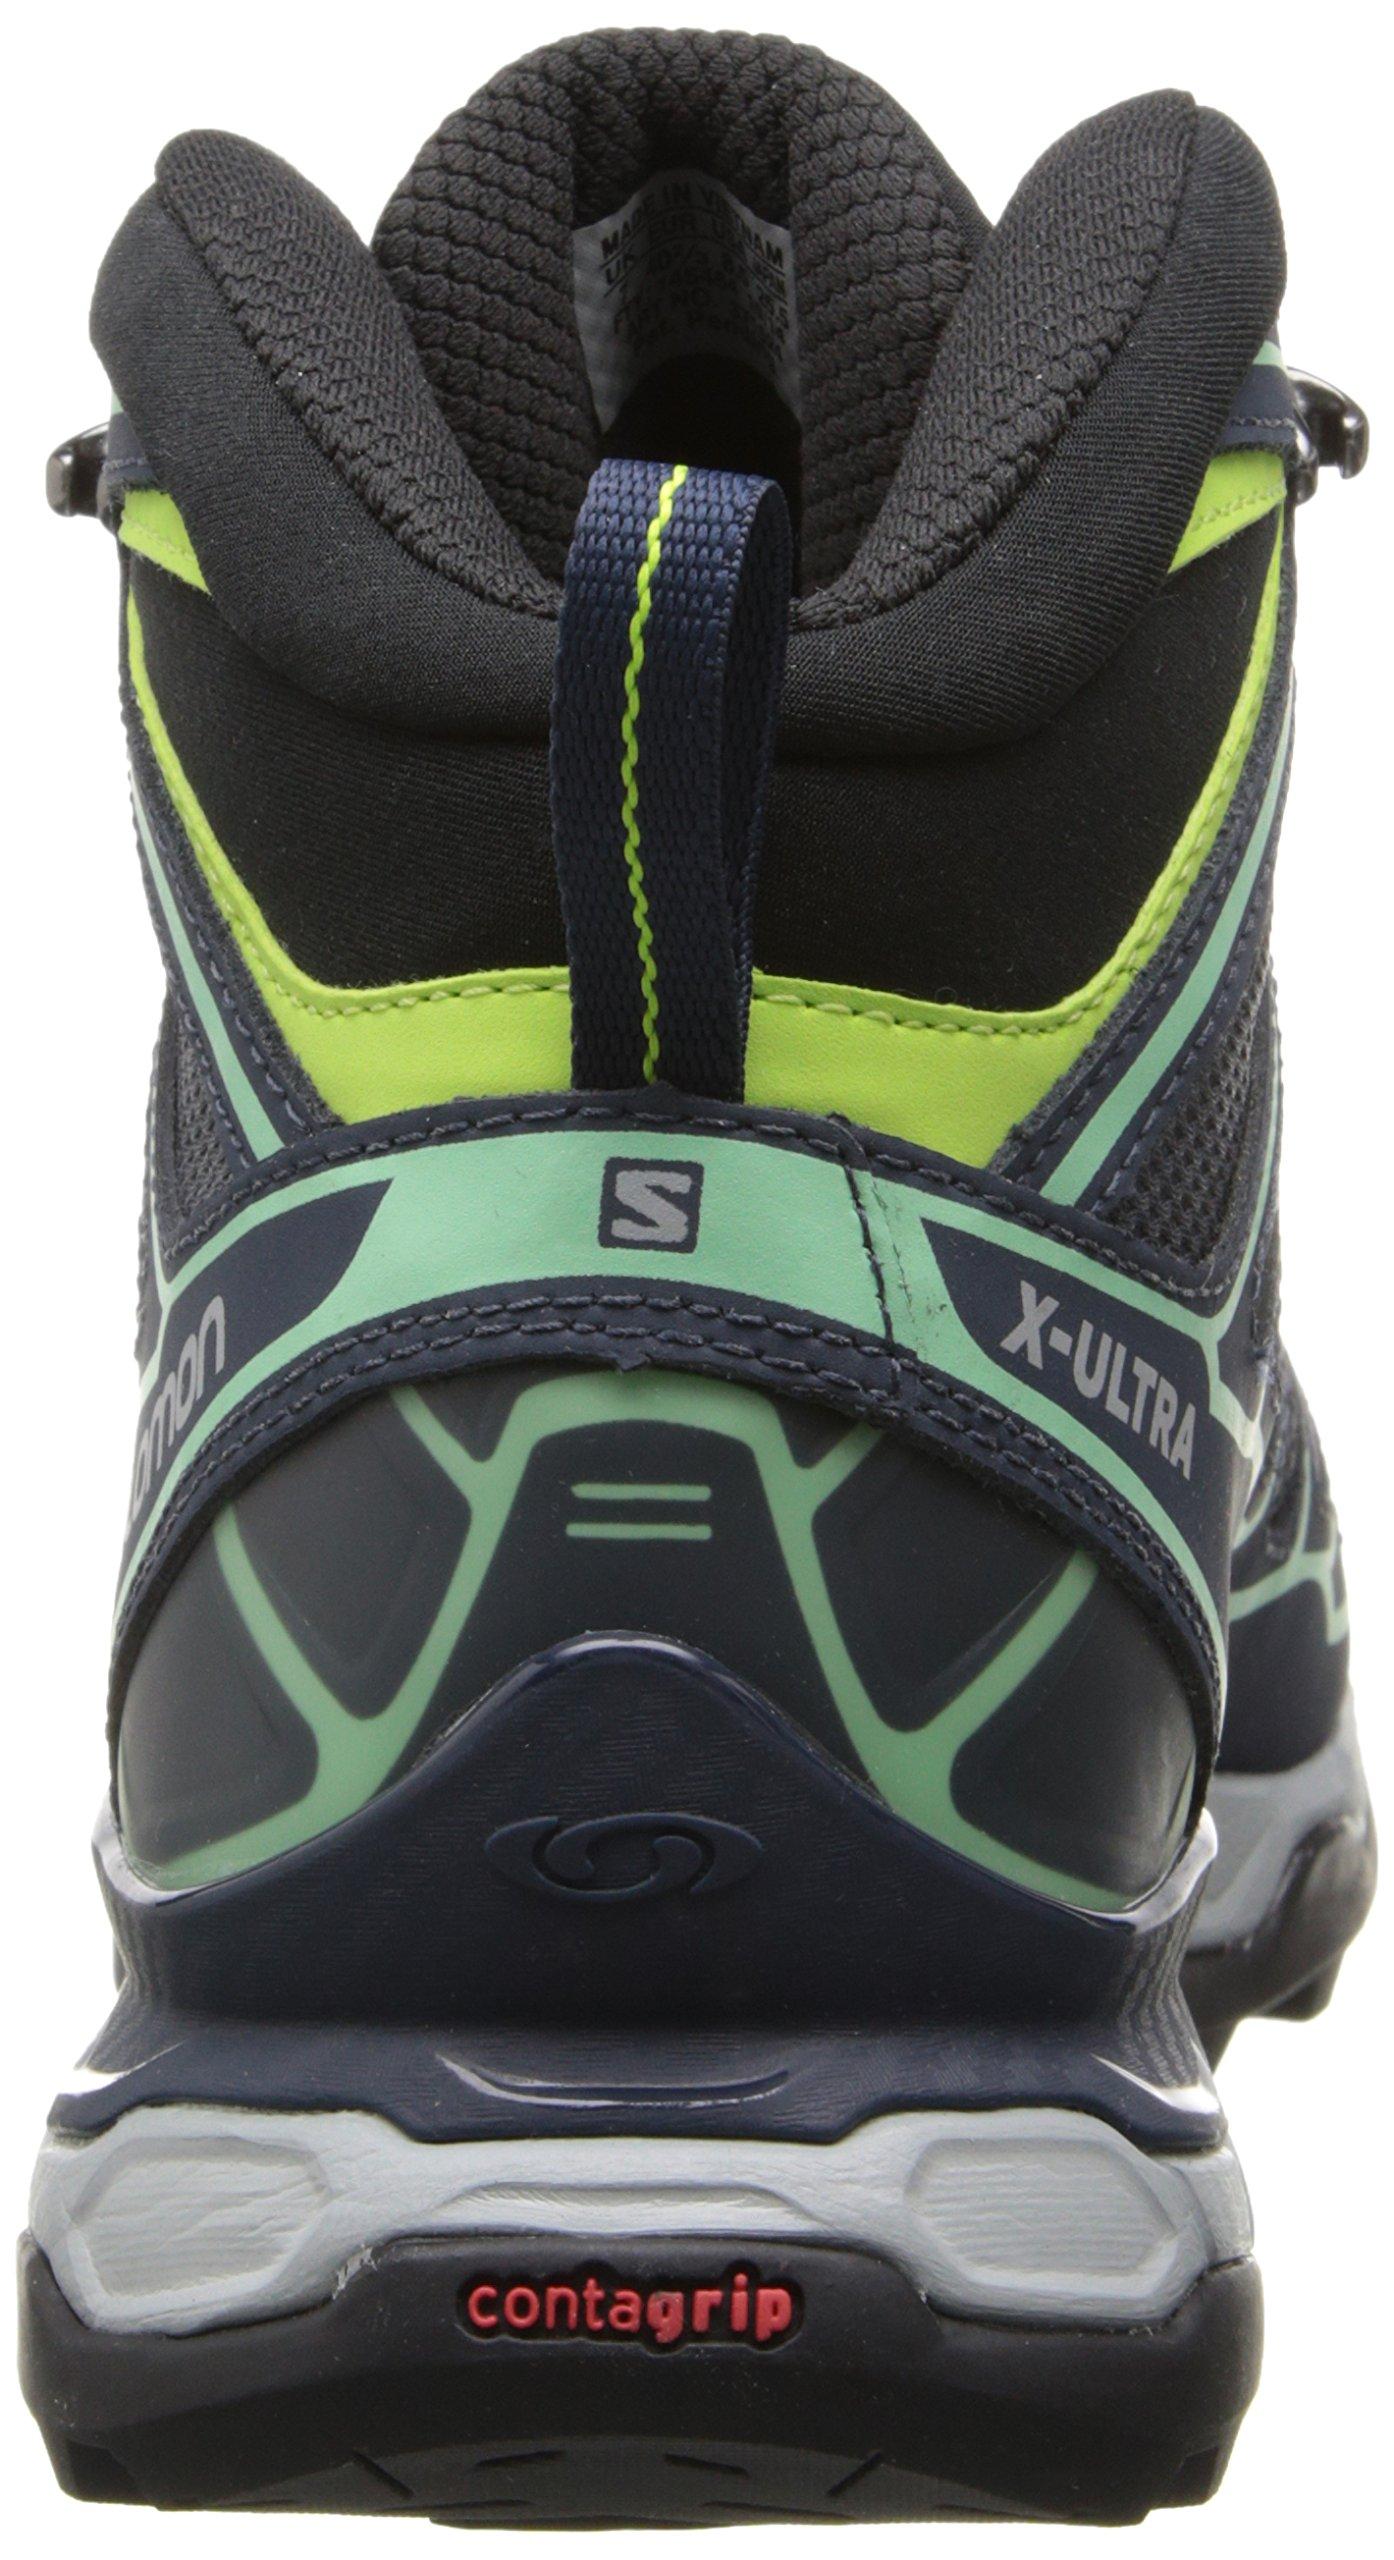 Salomon Women's X Ultra Mid 2 GTX Hiking Shoe, Grey Denim/Deep Blue/Lucite Green, 9 M US by Salomon (Image #2)